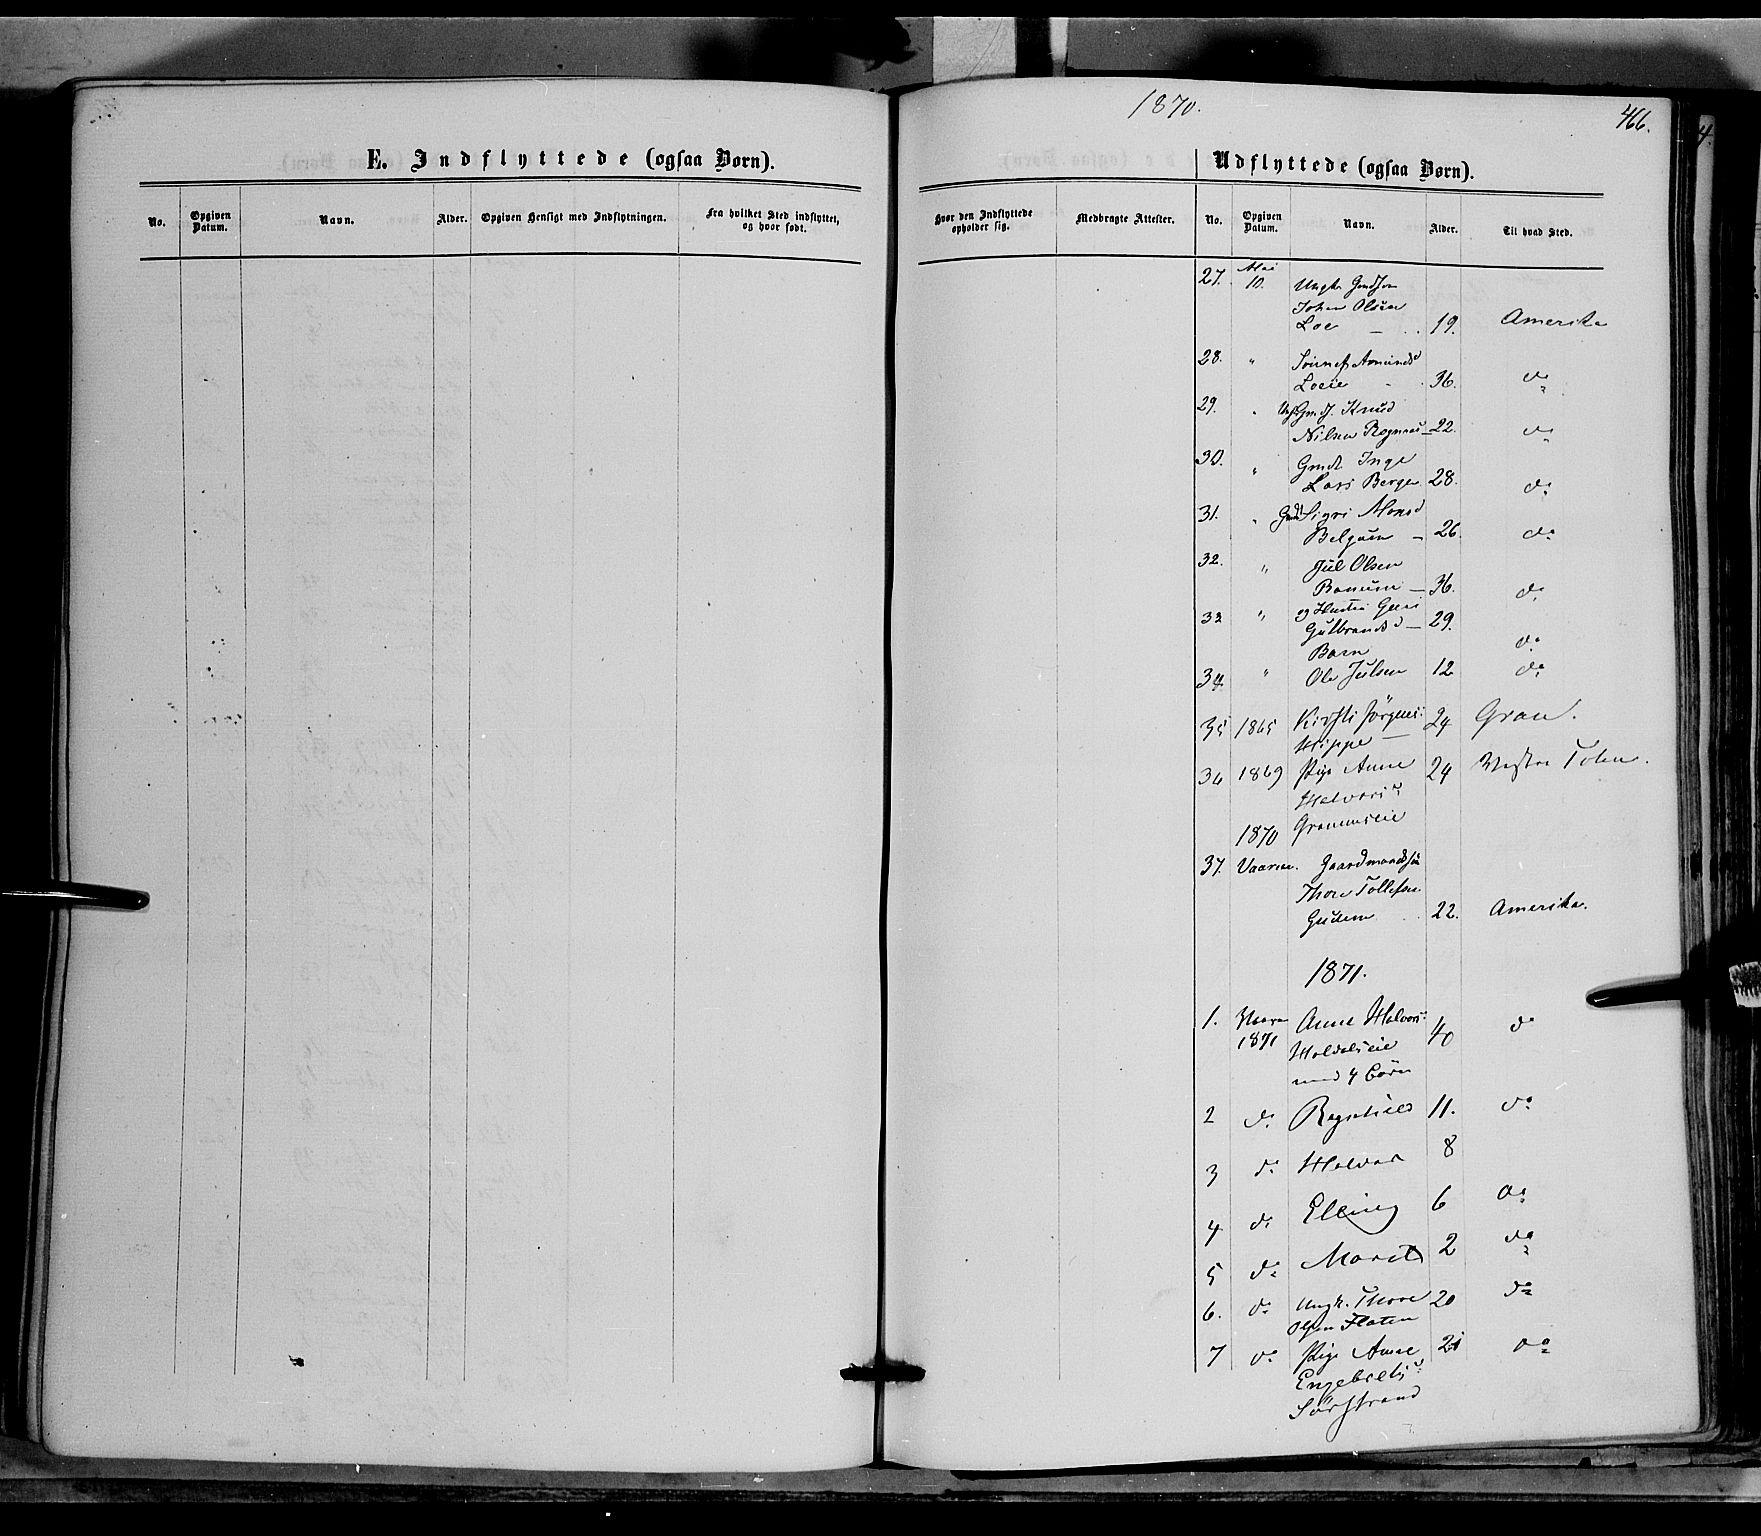 SAH, Nord-Aurdal prestekontor, Ministerialbok nr. 8, 1863-1875, s. 466